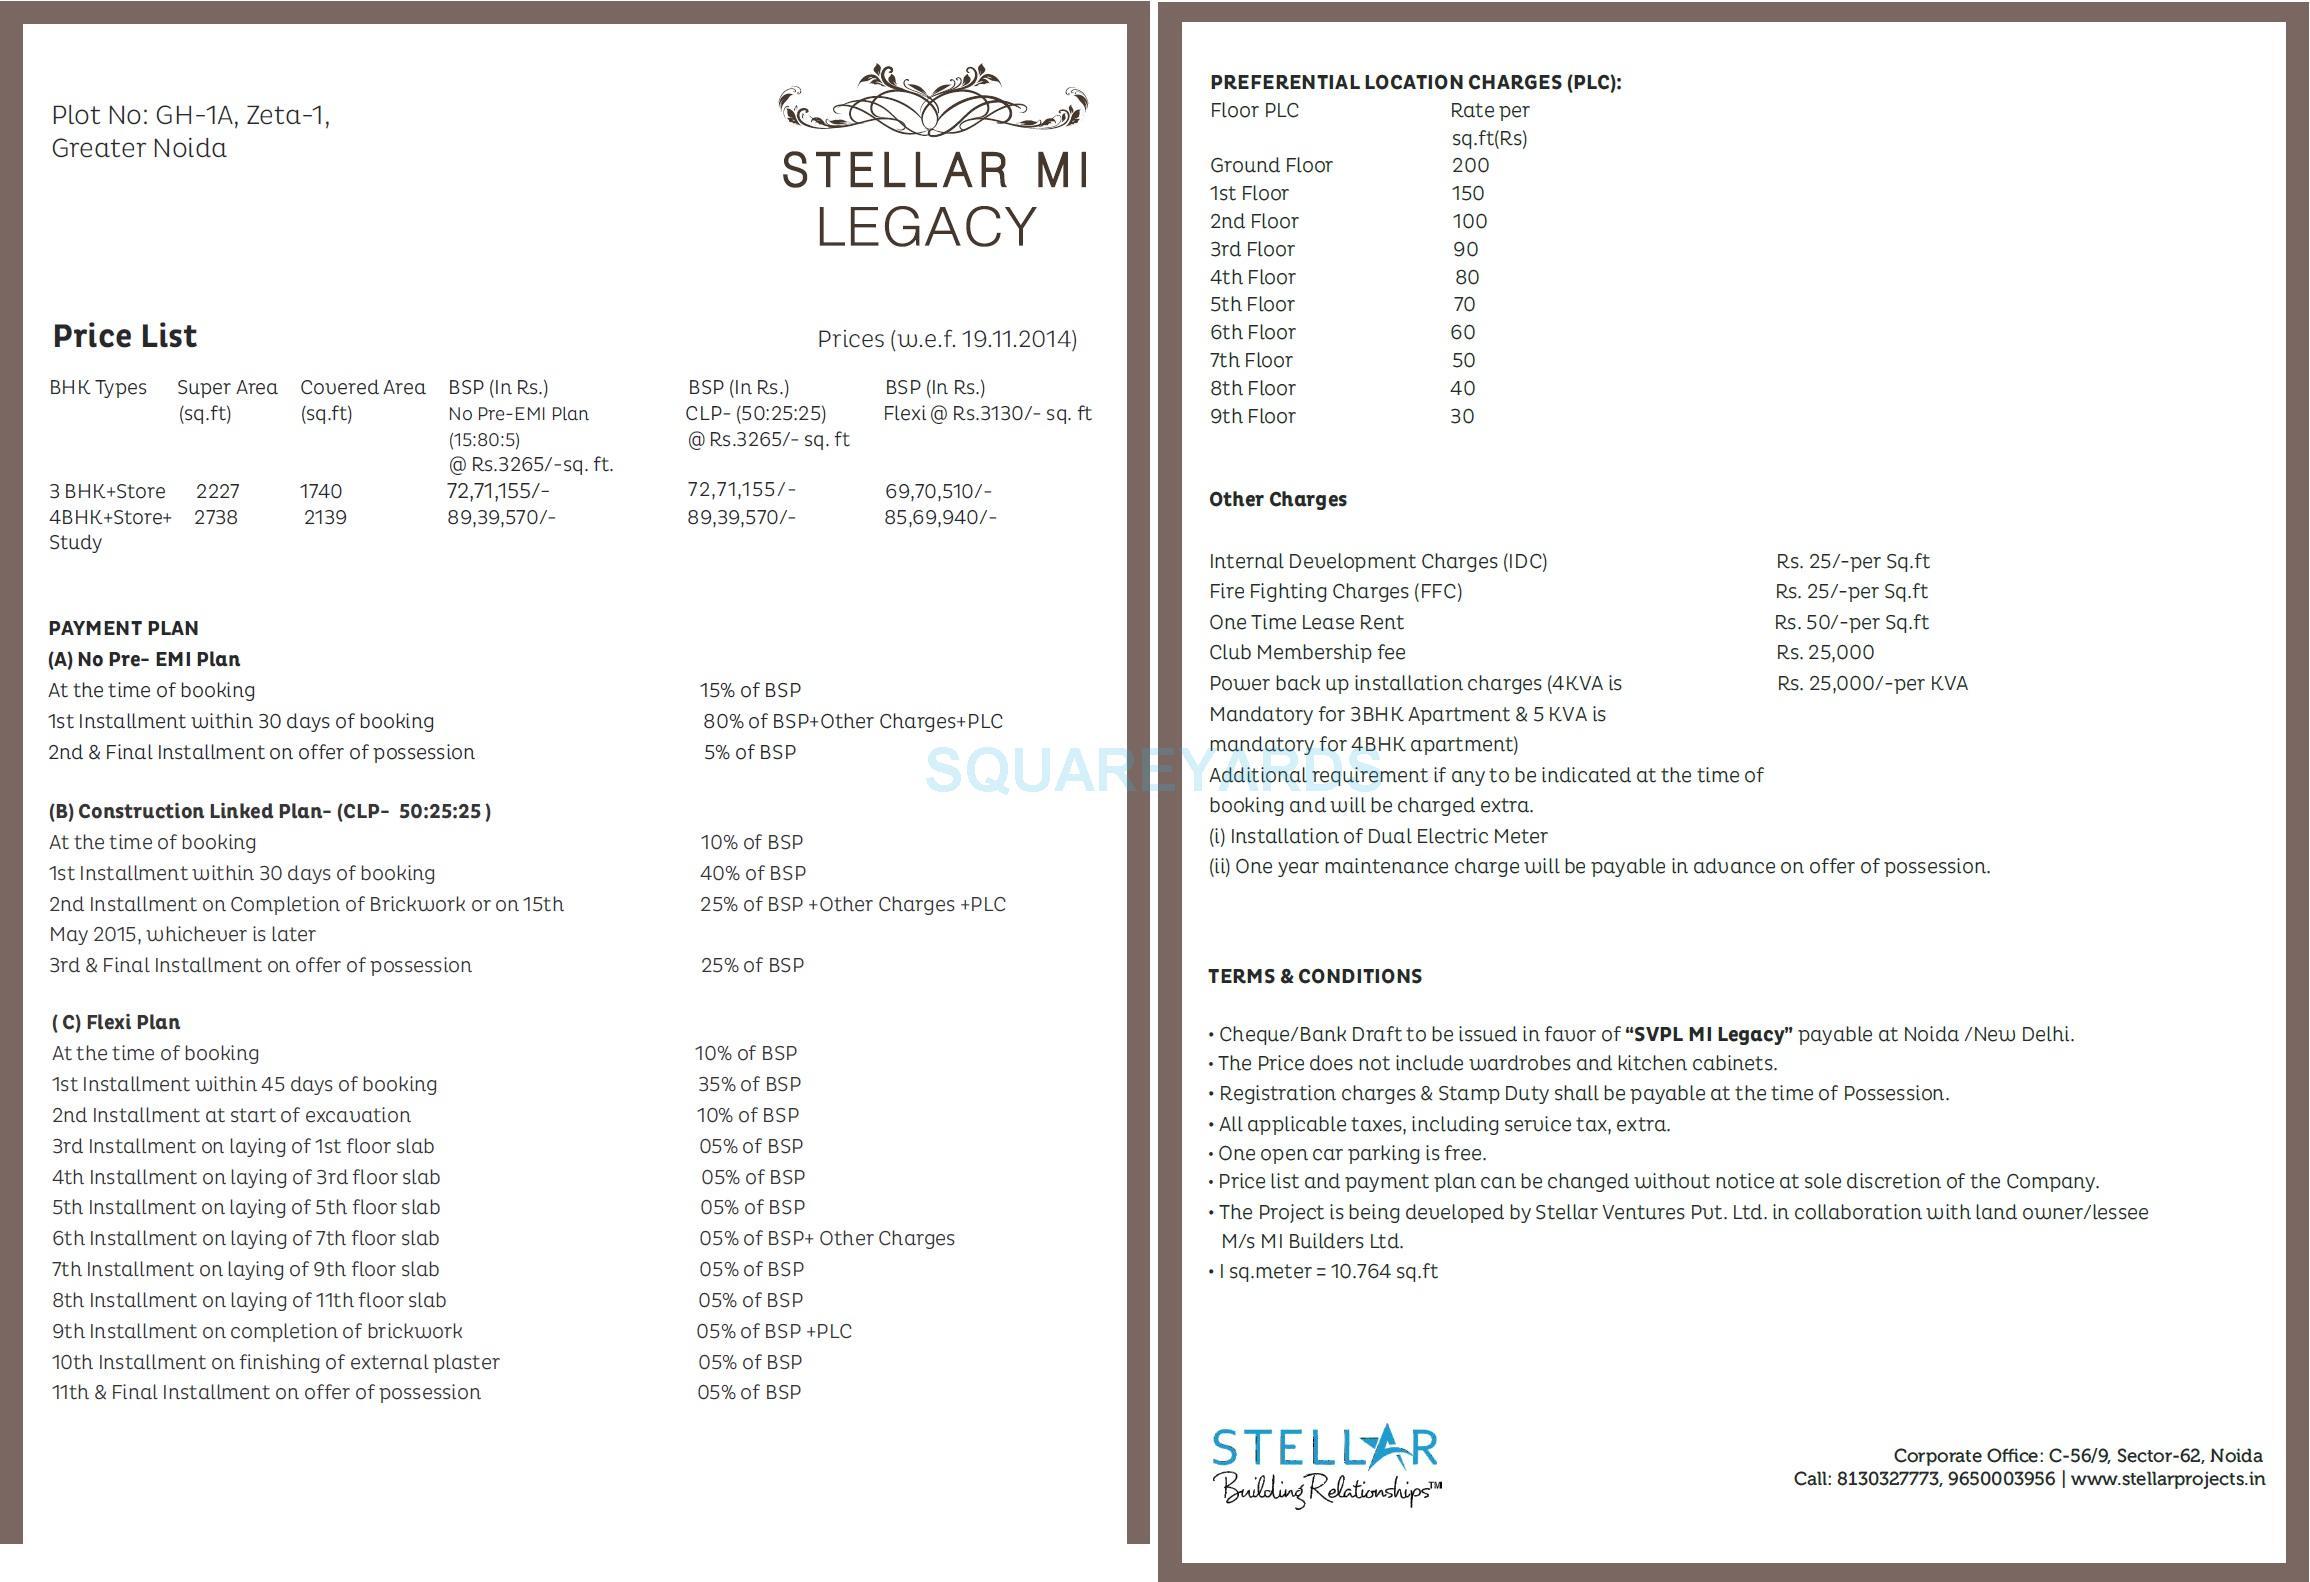 steller mi legacy payment plan image1